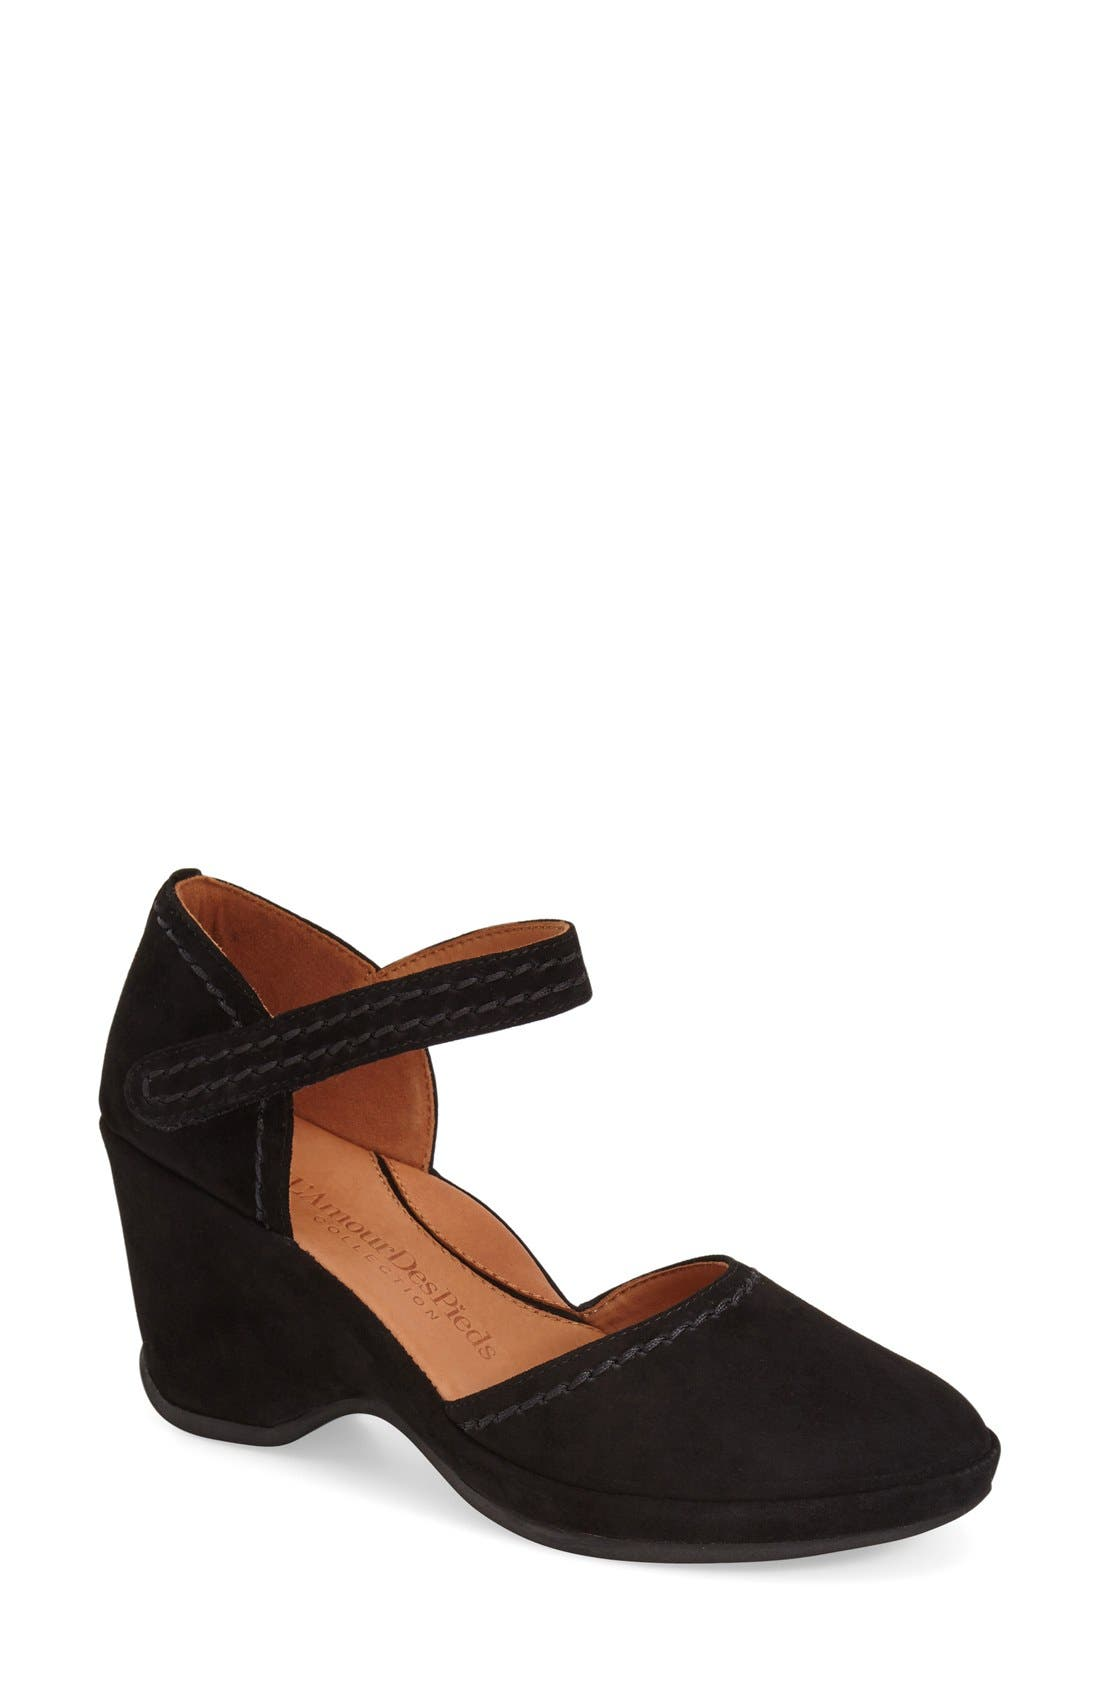 L'Amourdes Pieds'Orva' Wedge Sandal,                             Main thumbnail 1, color,                             Black Kidsuede